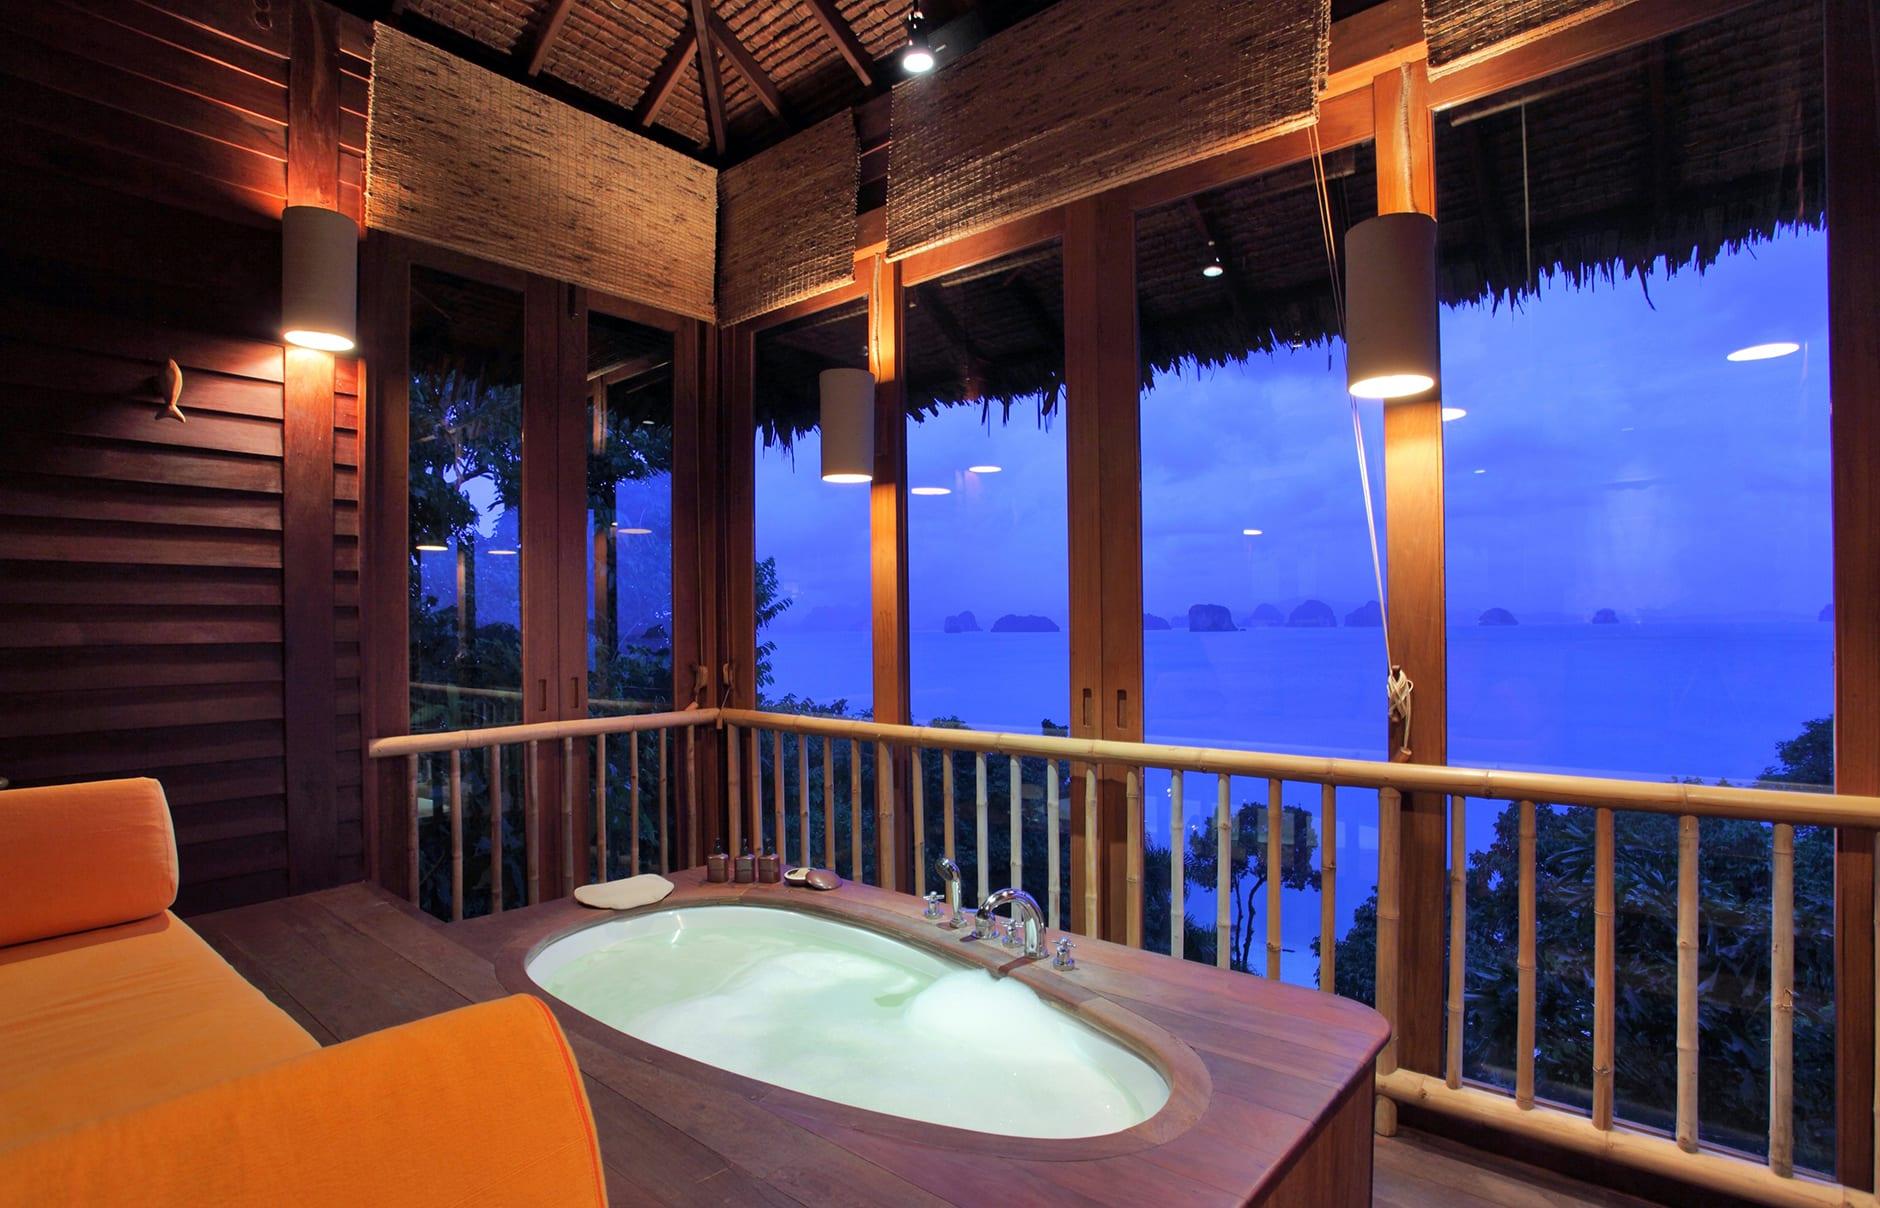 Ocean Panorama Pool Villa Bathroom. Six Senses Yao Noi Beyond Phuket, Thailand. © Six Senses Hotels Resorts Spas